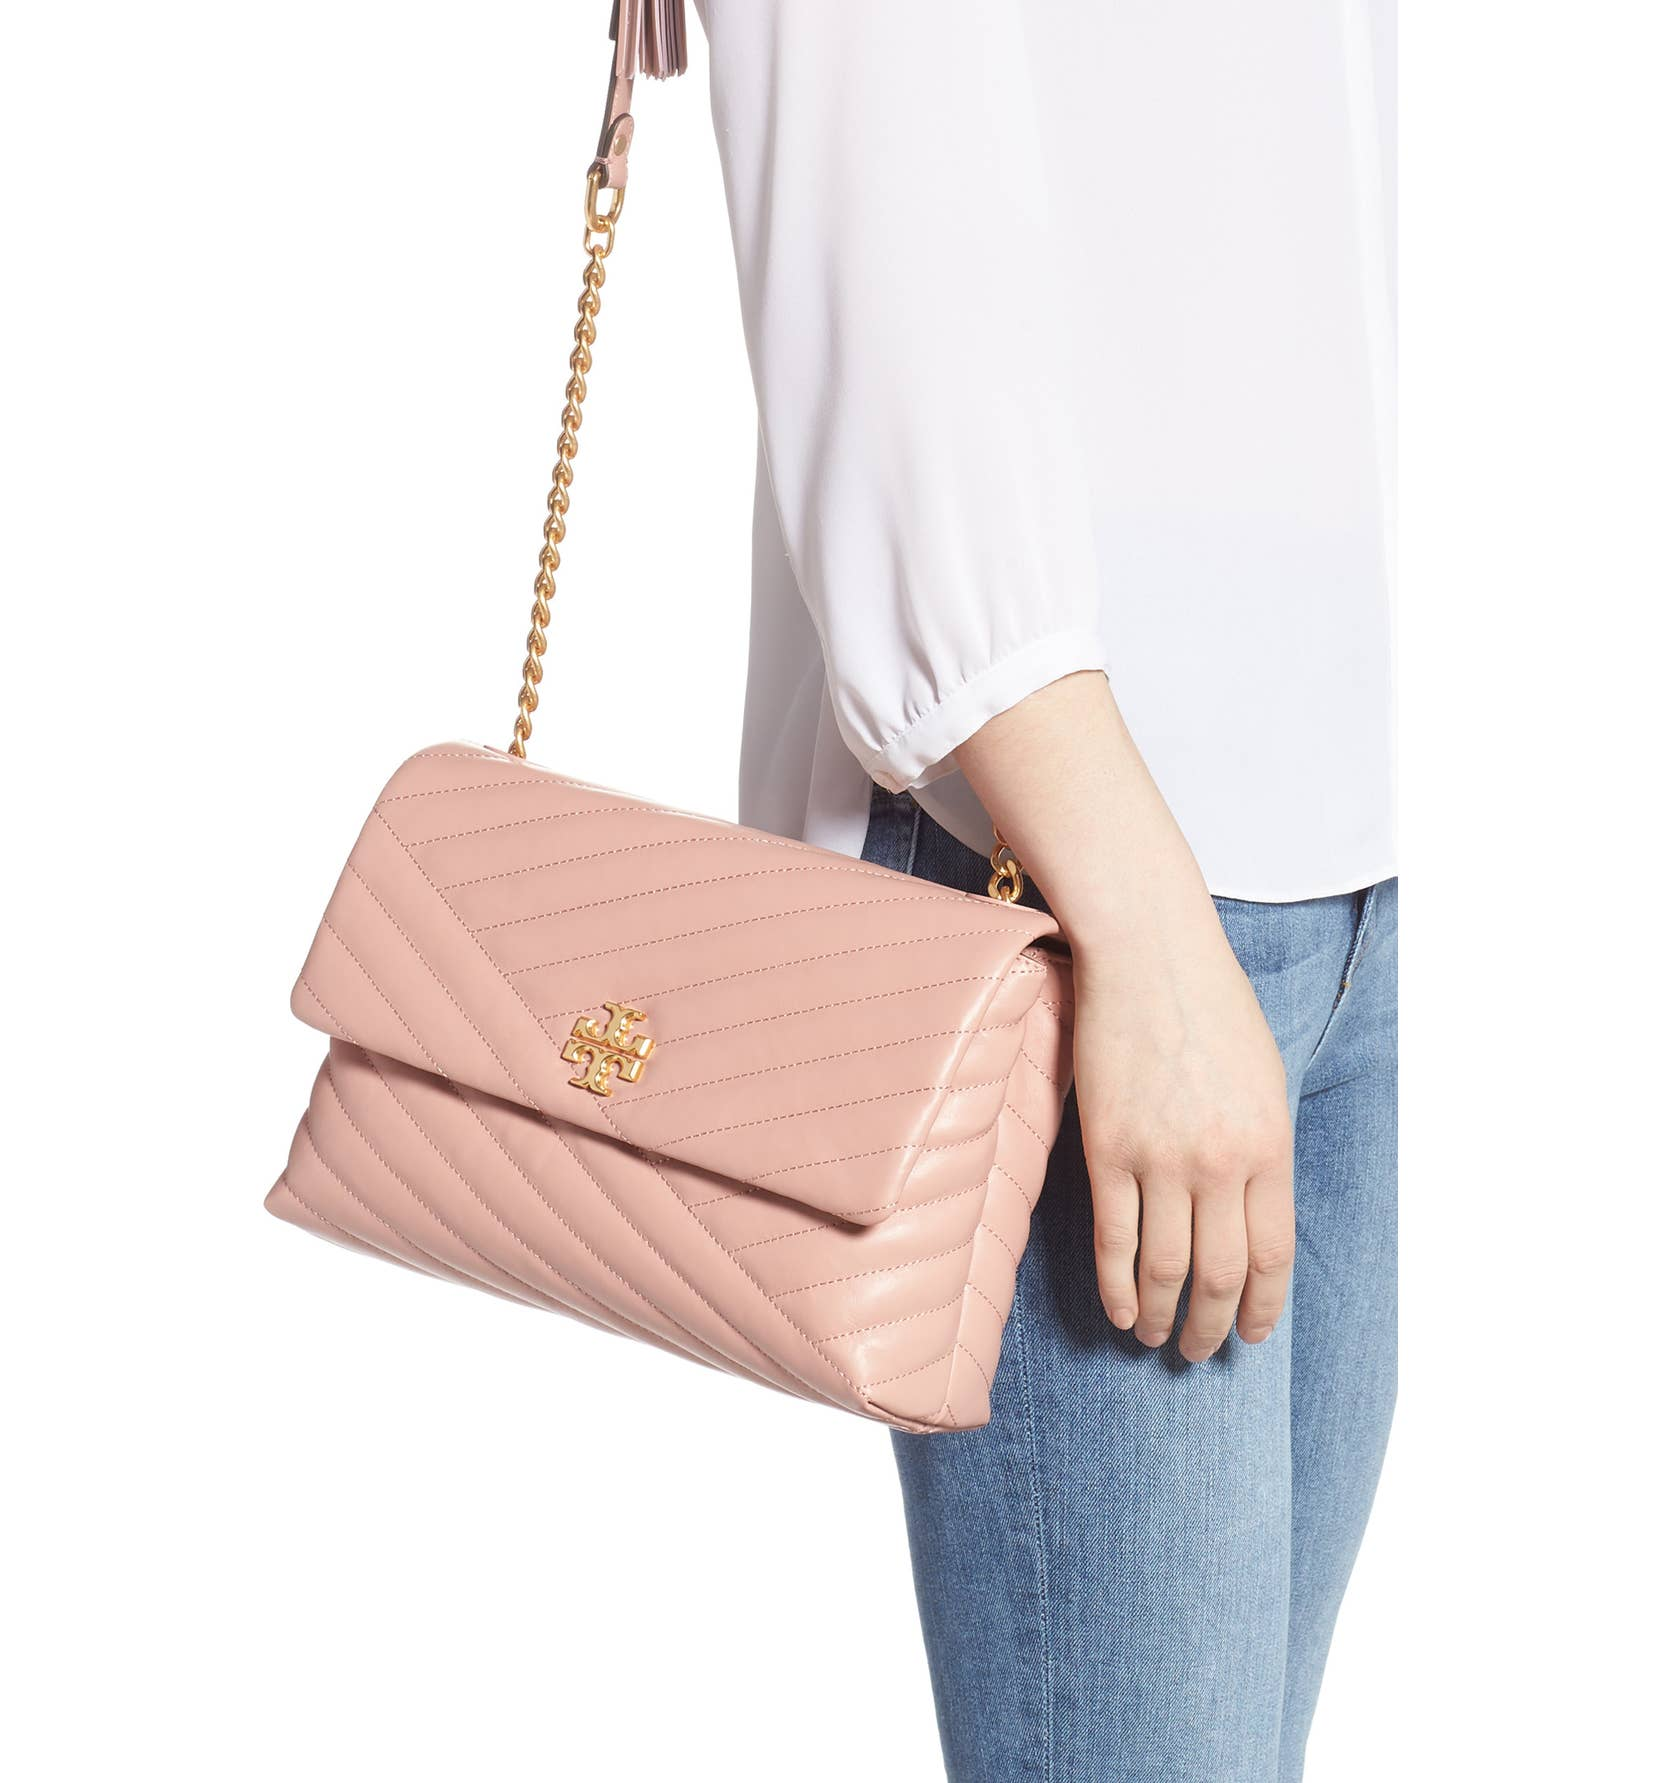 96bf4f8696c 472 TORY BURCH Kira Chevron Flap Shoulder Bag PINK MOON